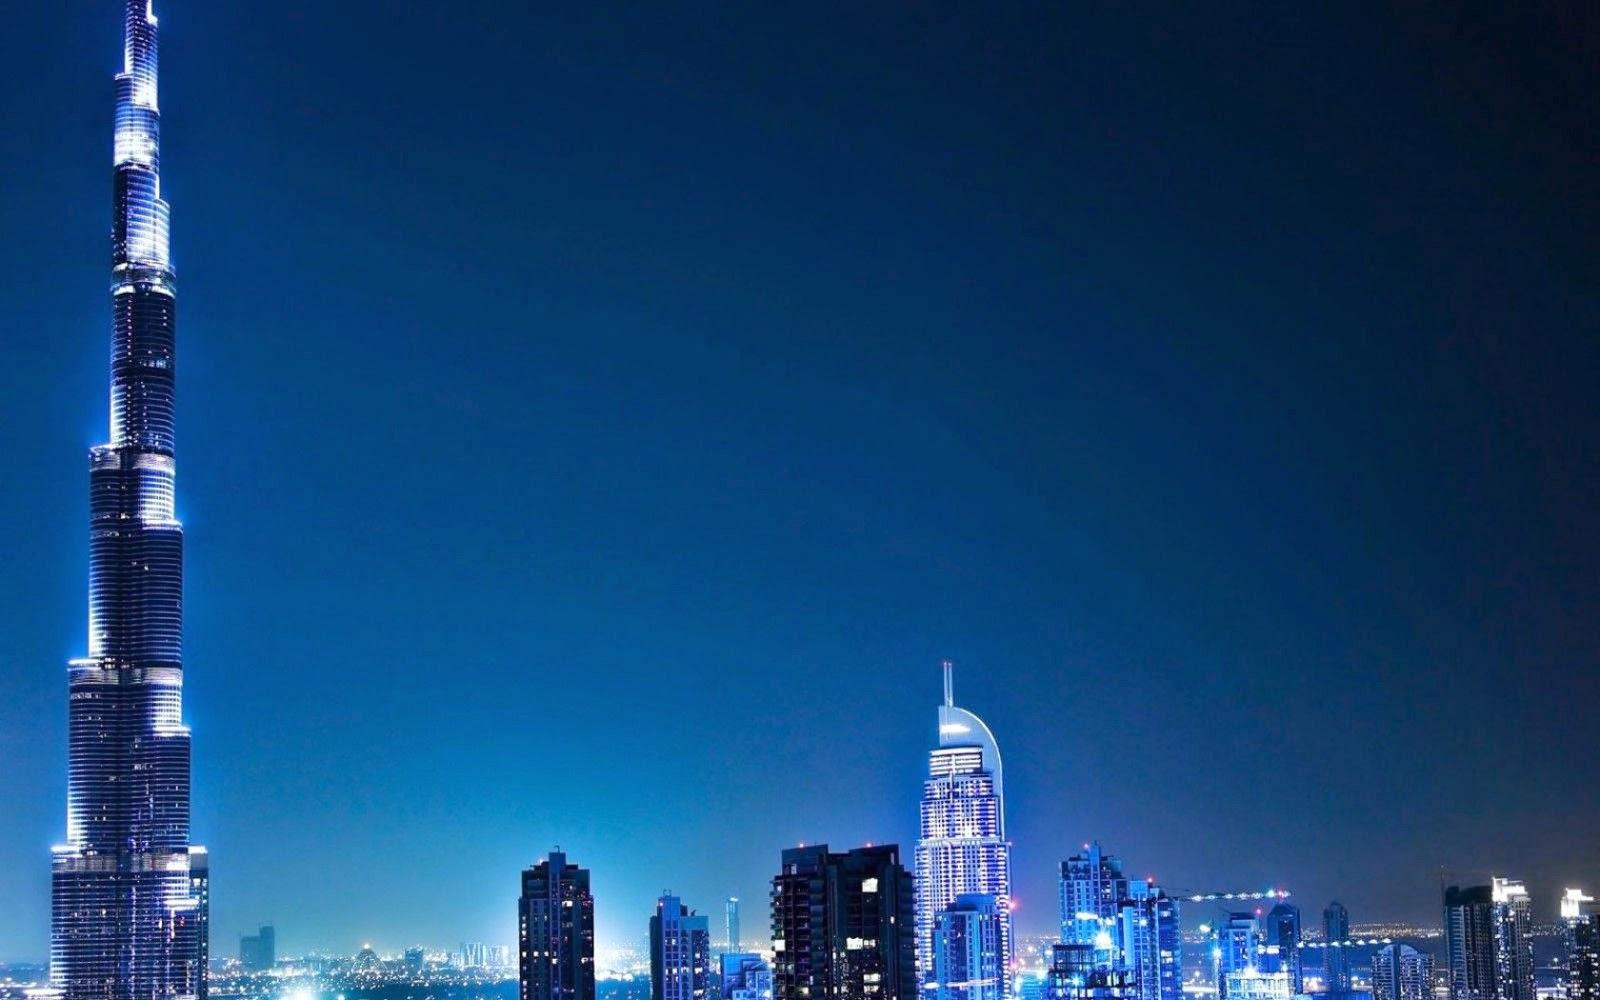 Hd wallpapers burj khalifa wallpapers at night - Dubai burj khalifa hd wallpaper ...